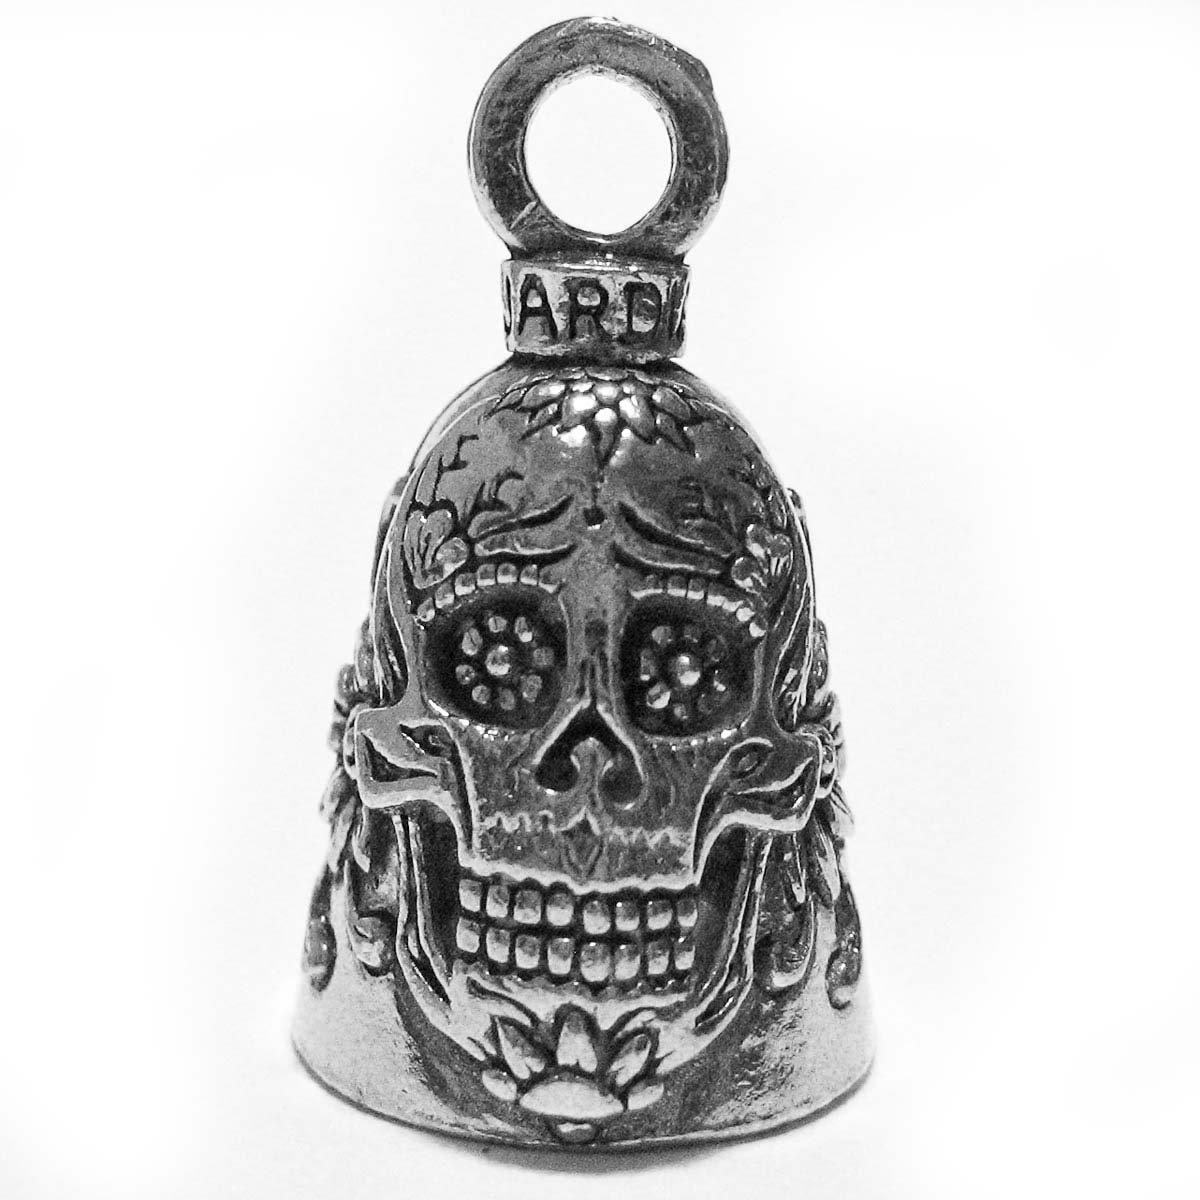 Guardian® Sugar Skull Flowers of Death Motorcycle Biker Luck Gremlin Riding Bell Guardian® Bell LYSB00ACKLOEY-SPRTSEQIP